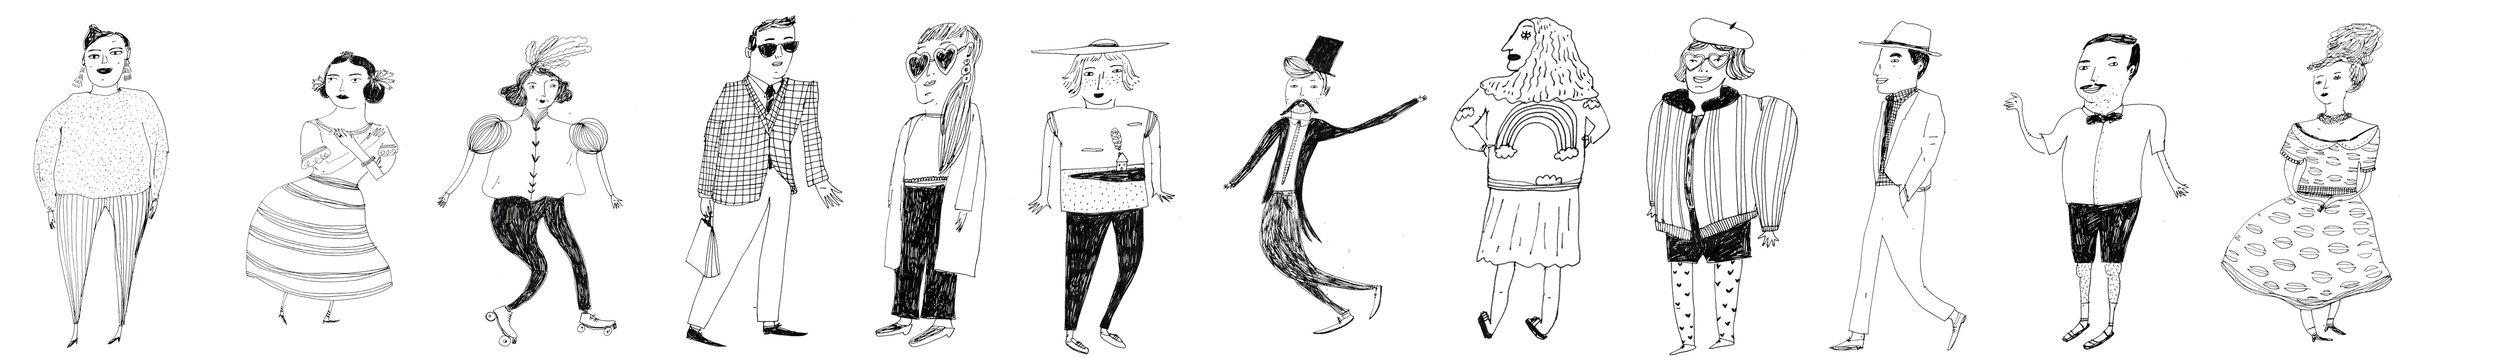 stylish people illustration